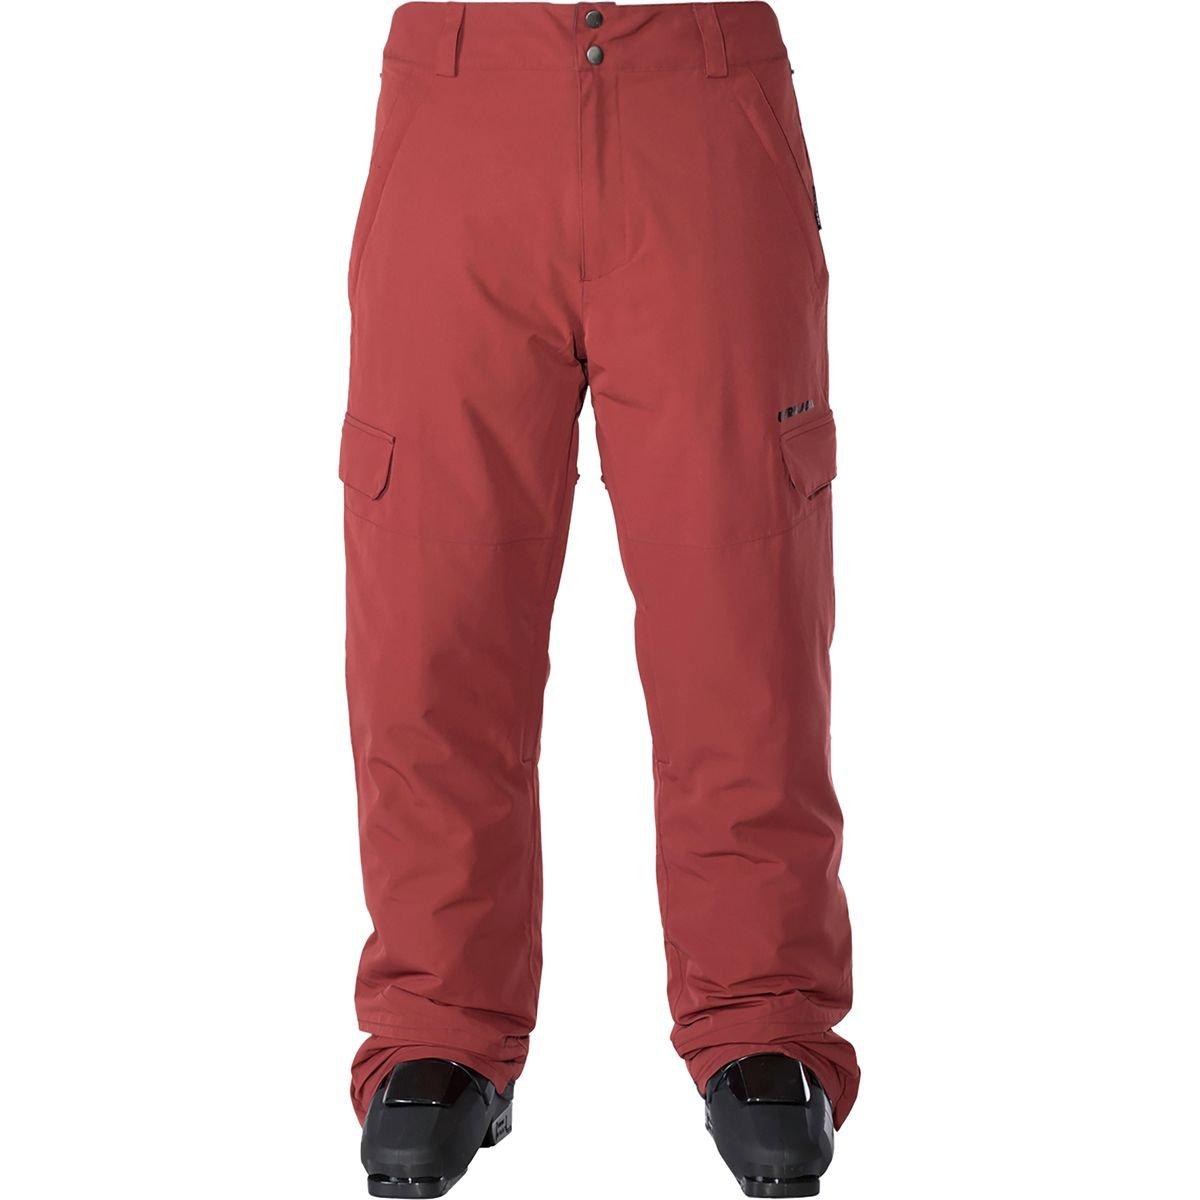 Armada Men's Union Insulated Pant - Port - Small